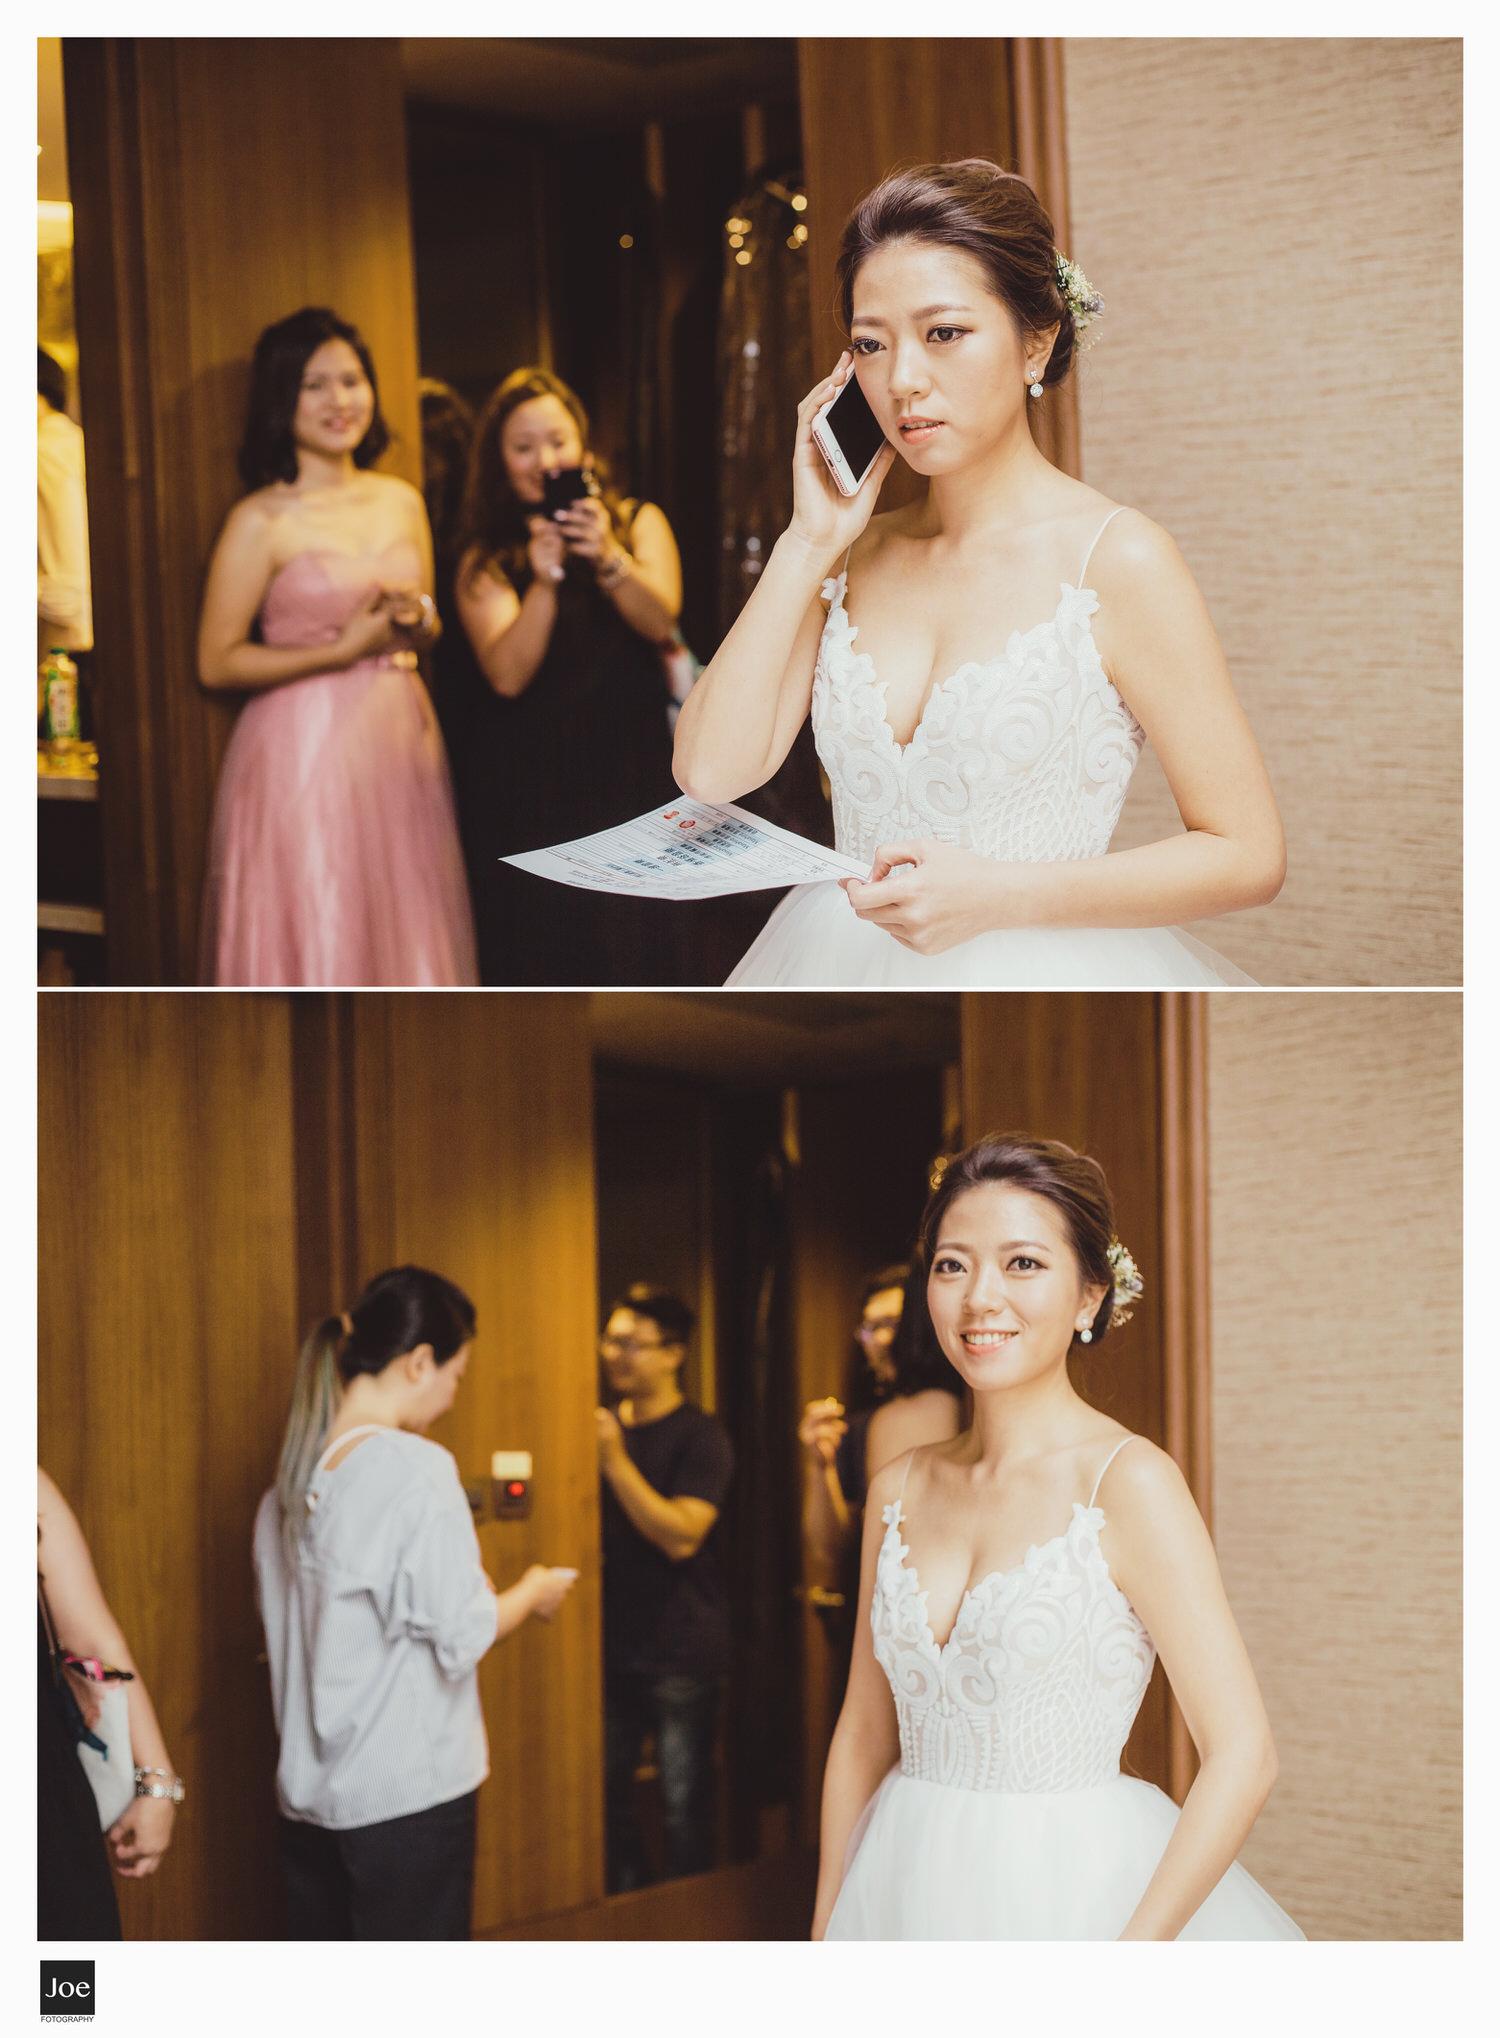 wedding-photography-shangri-la-far-eastern-plaza-hotel-ariel-sam-joe-fotography-108.jpg